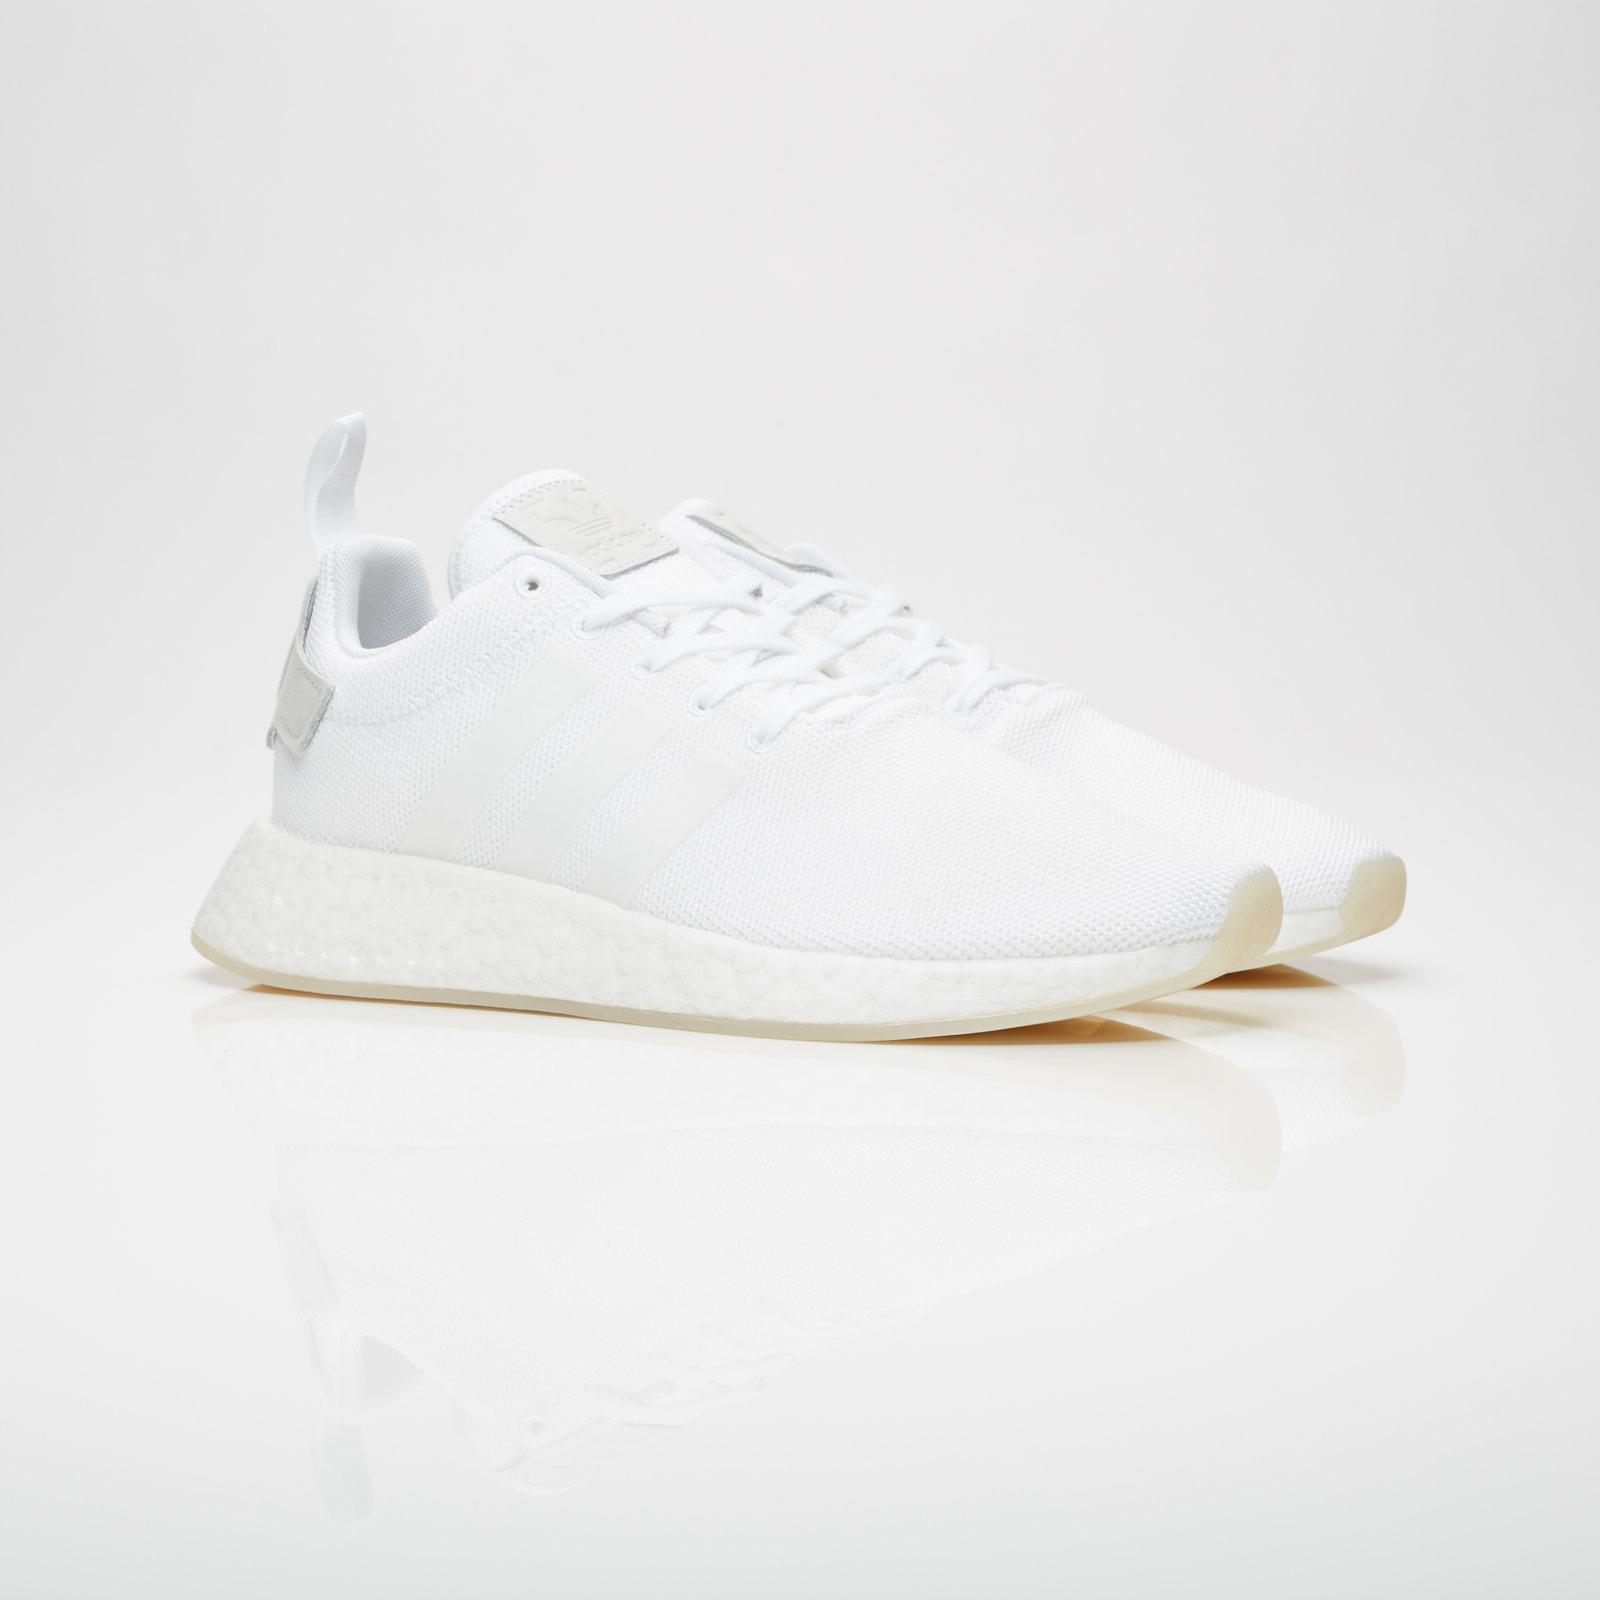 adidas NMD R2 - Cq2401 - Sneakersnstuff